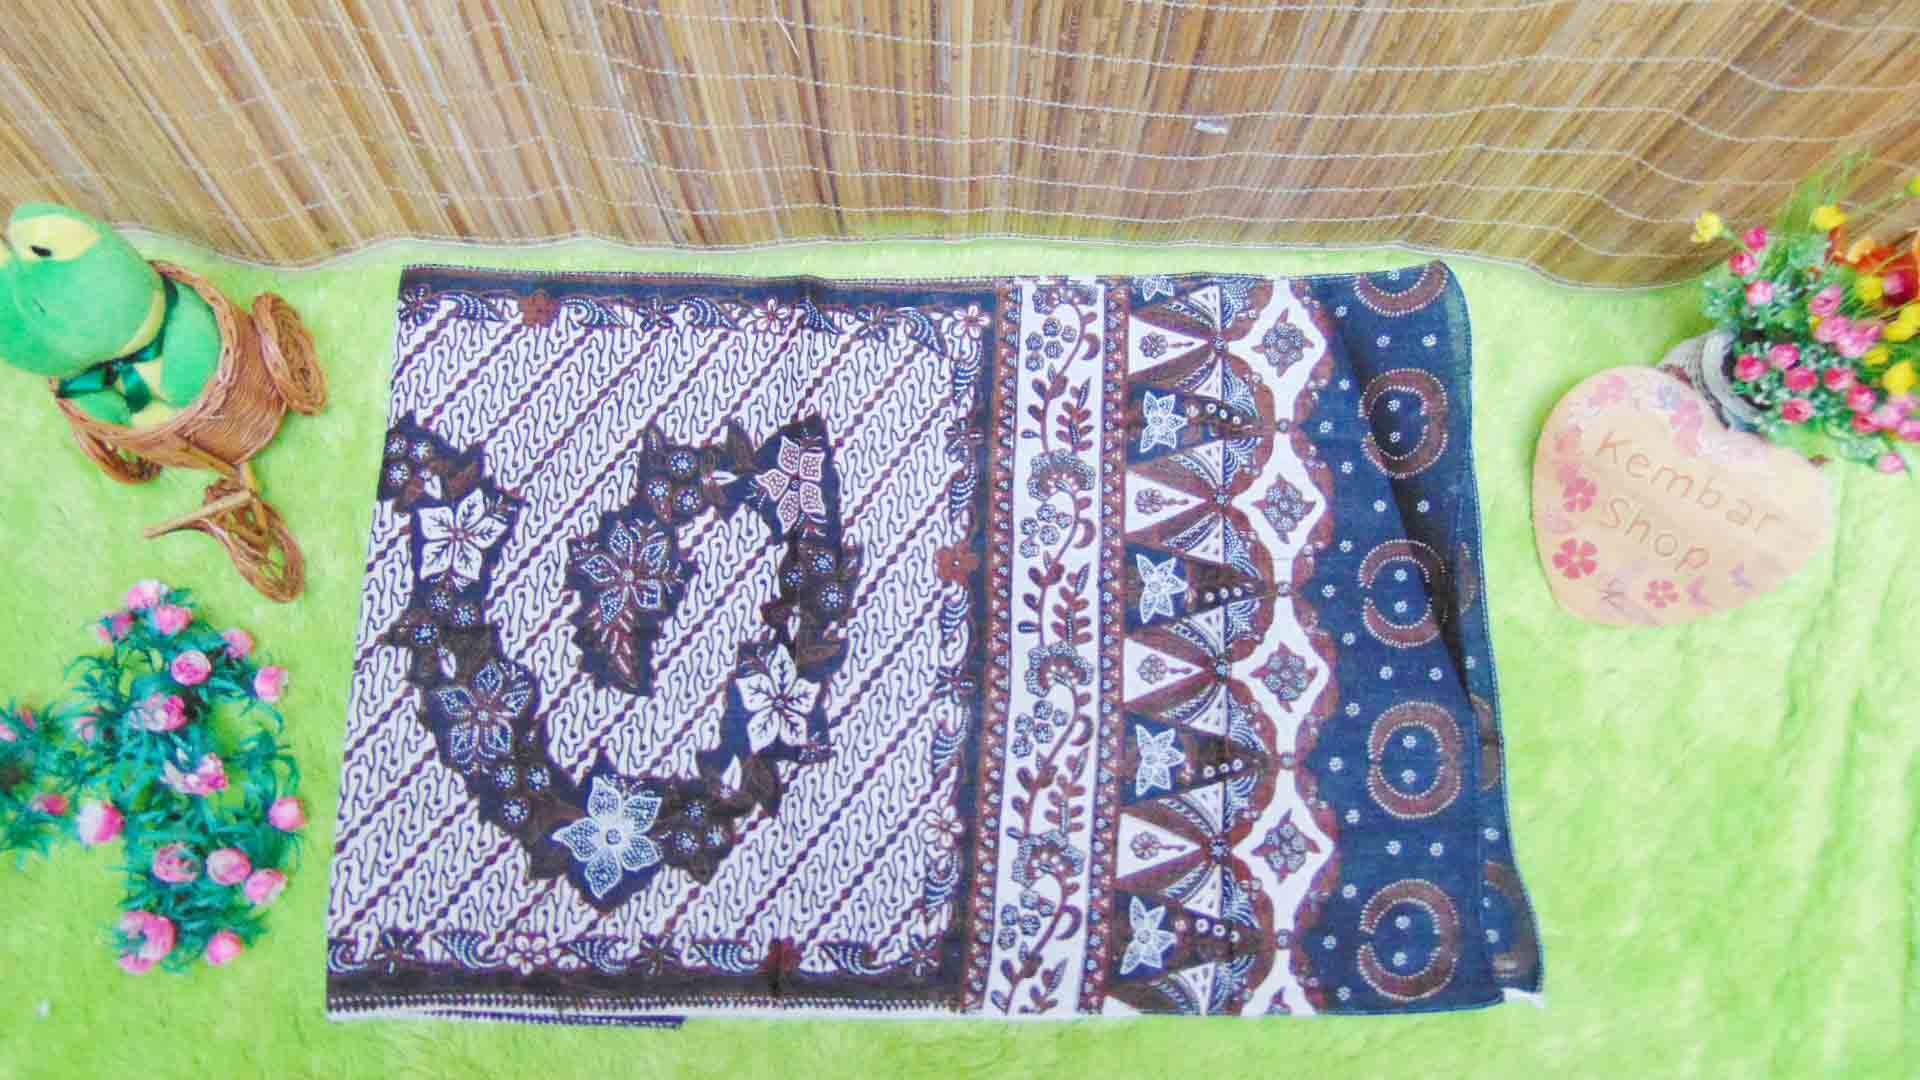 swaddle baby bedong kain batik bayi memanjang aneka motif tradisional random (3)